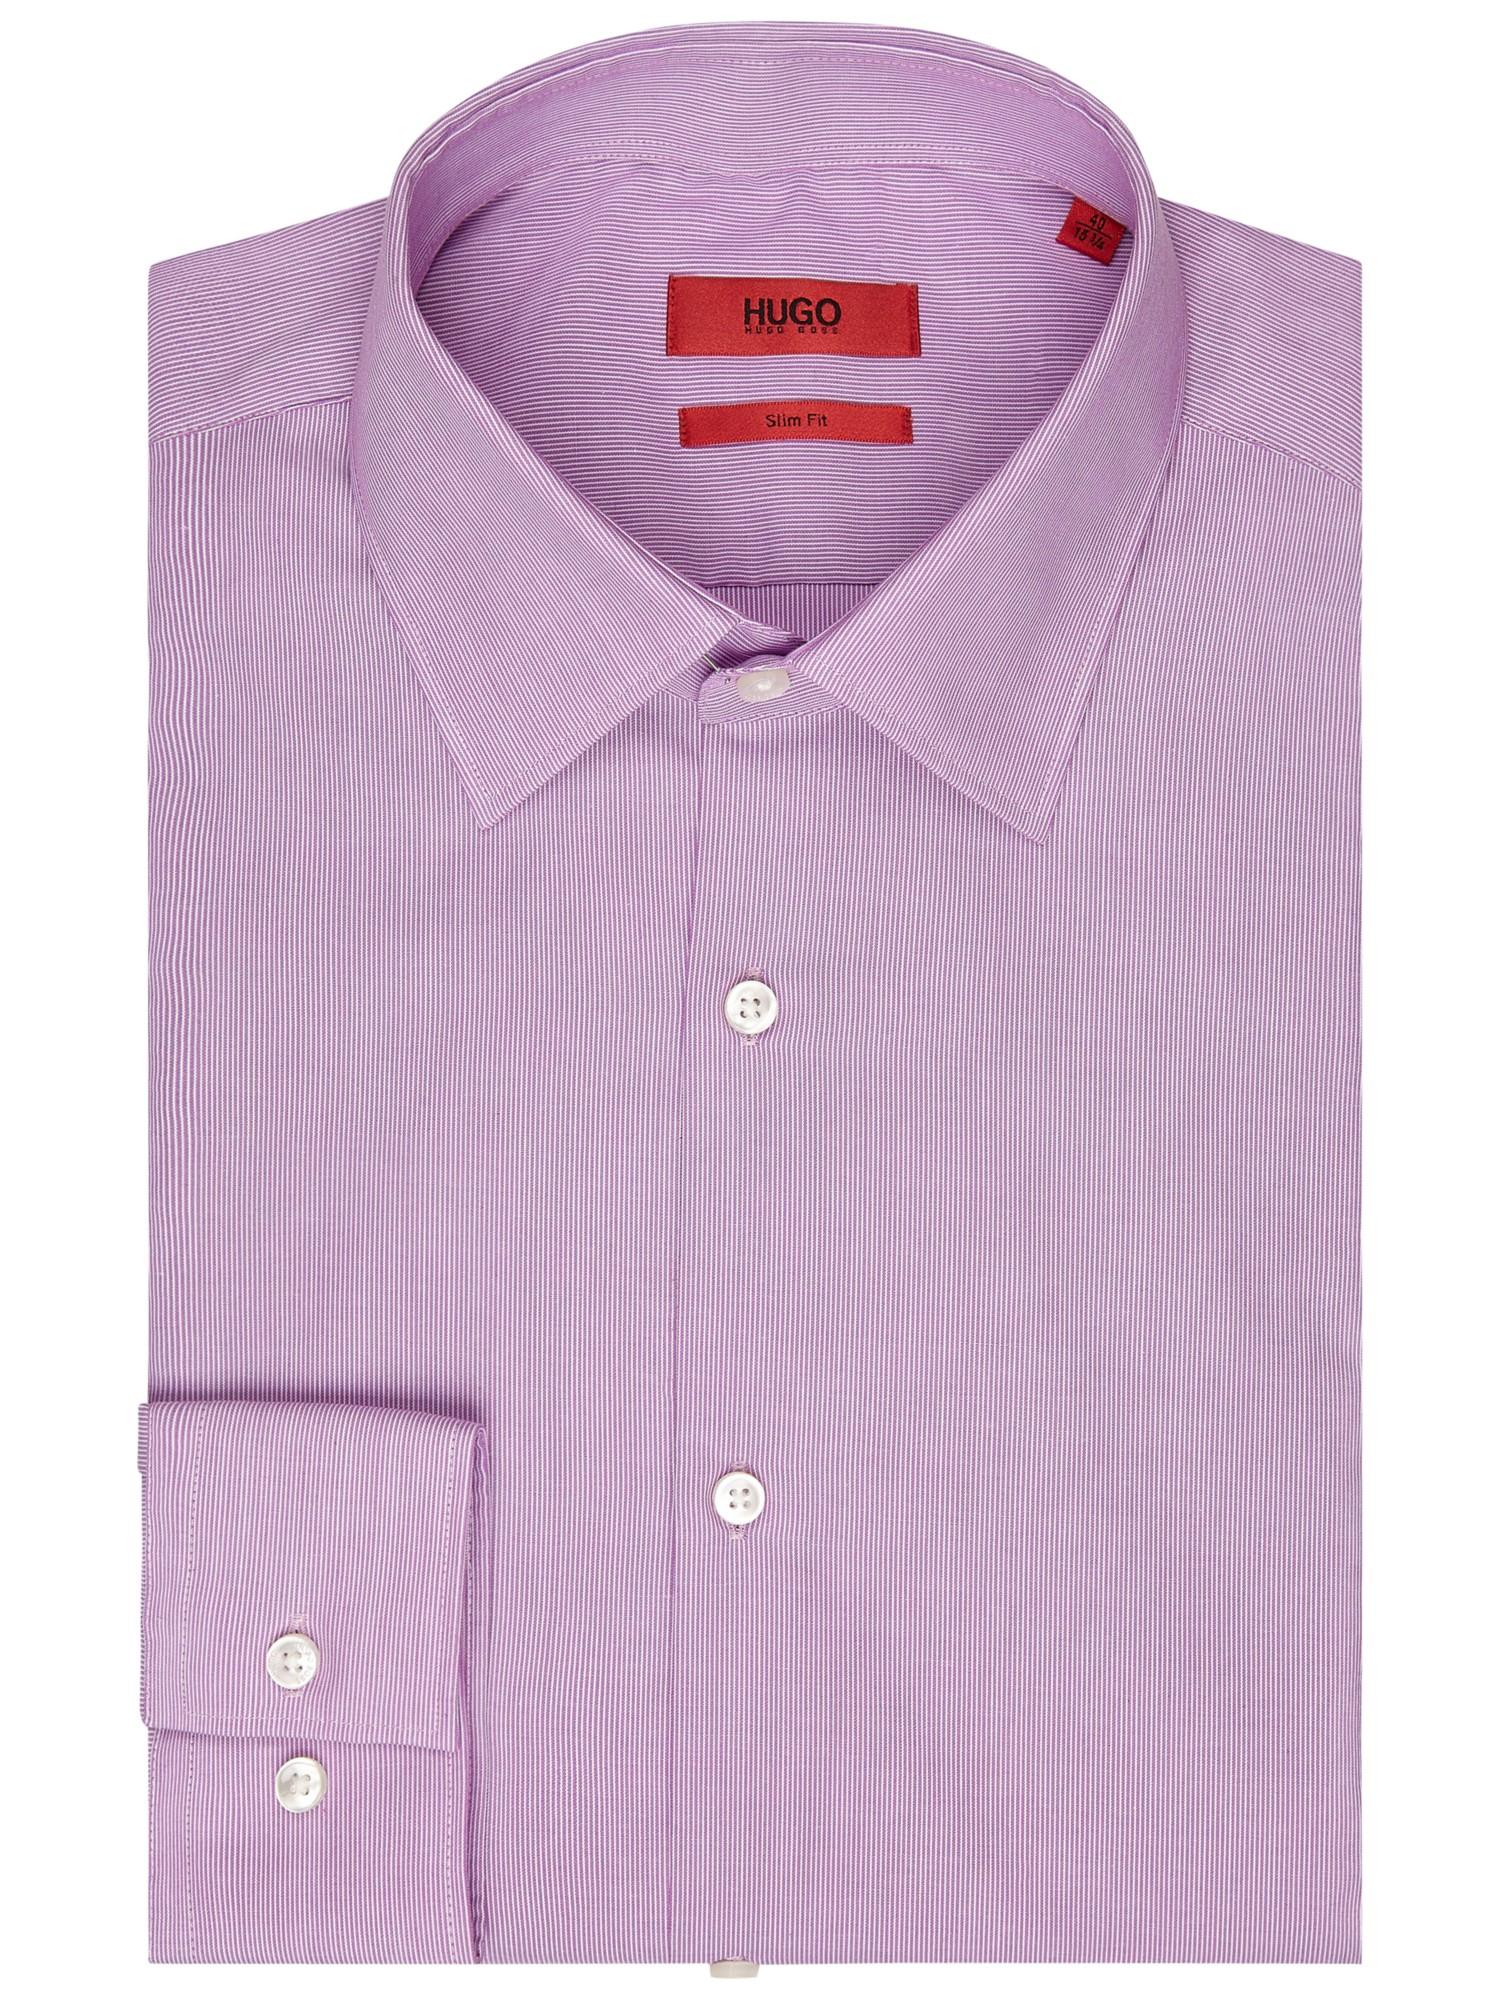 Boss hugo by jacob stripe slim fit shirt in purple for men for Hugo boss formal shirts